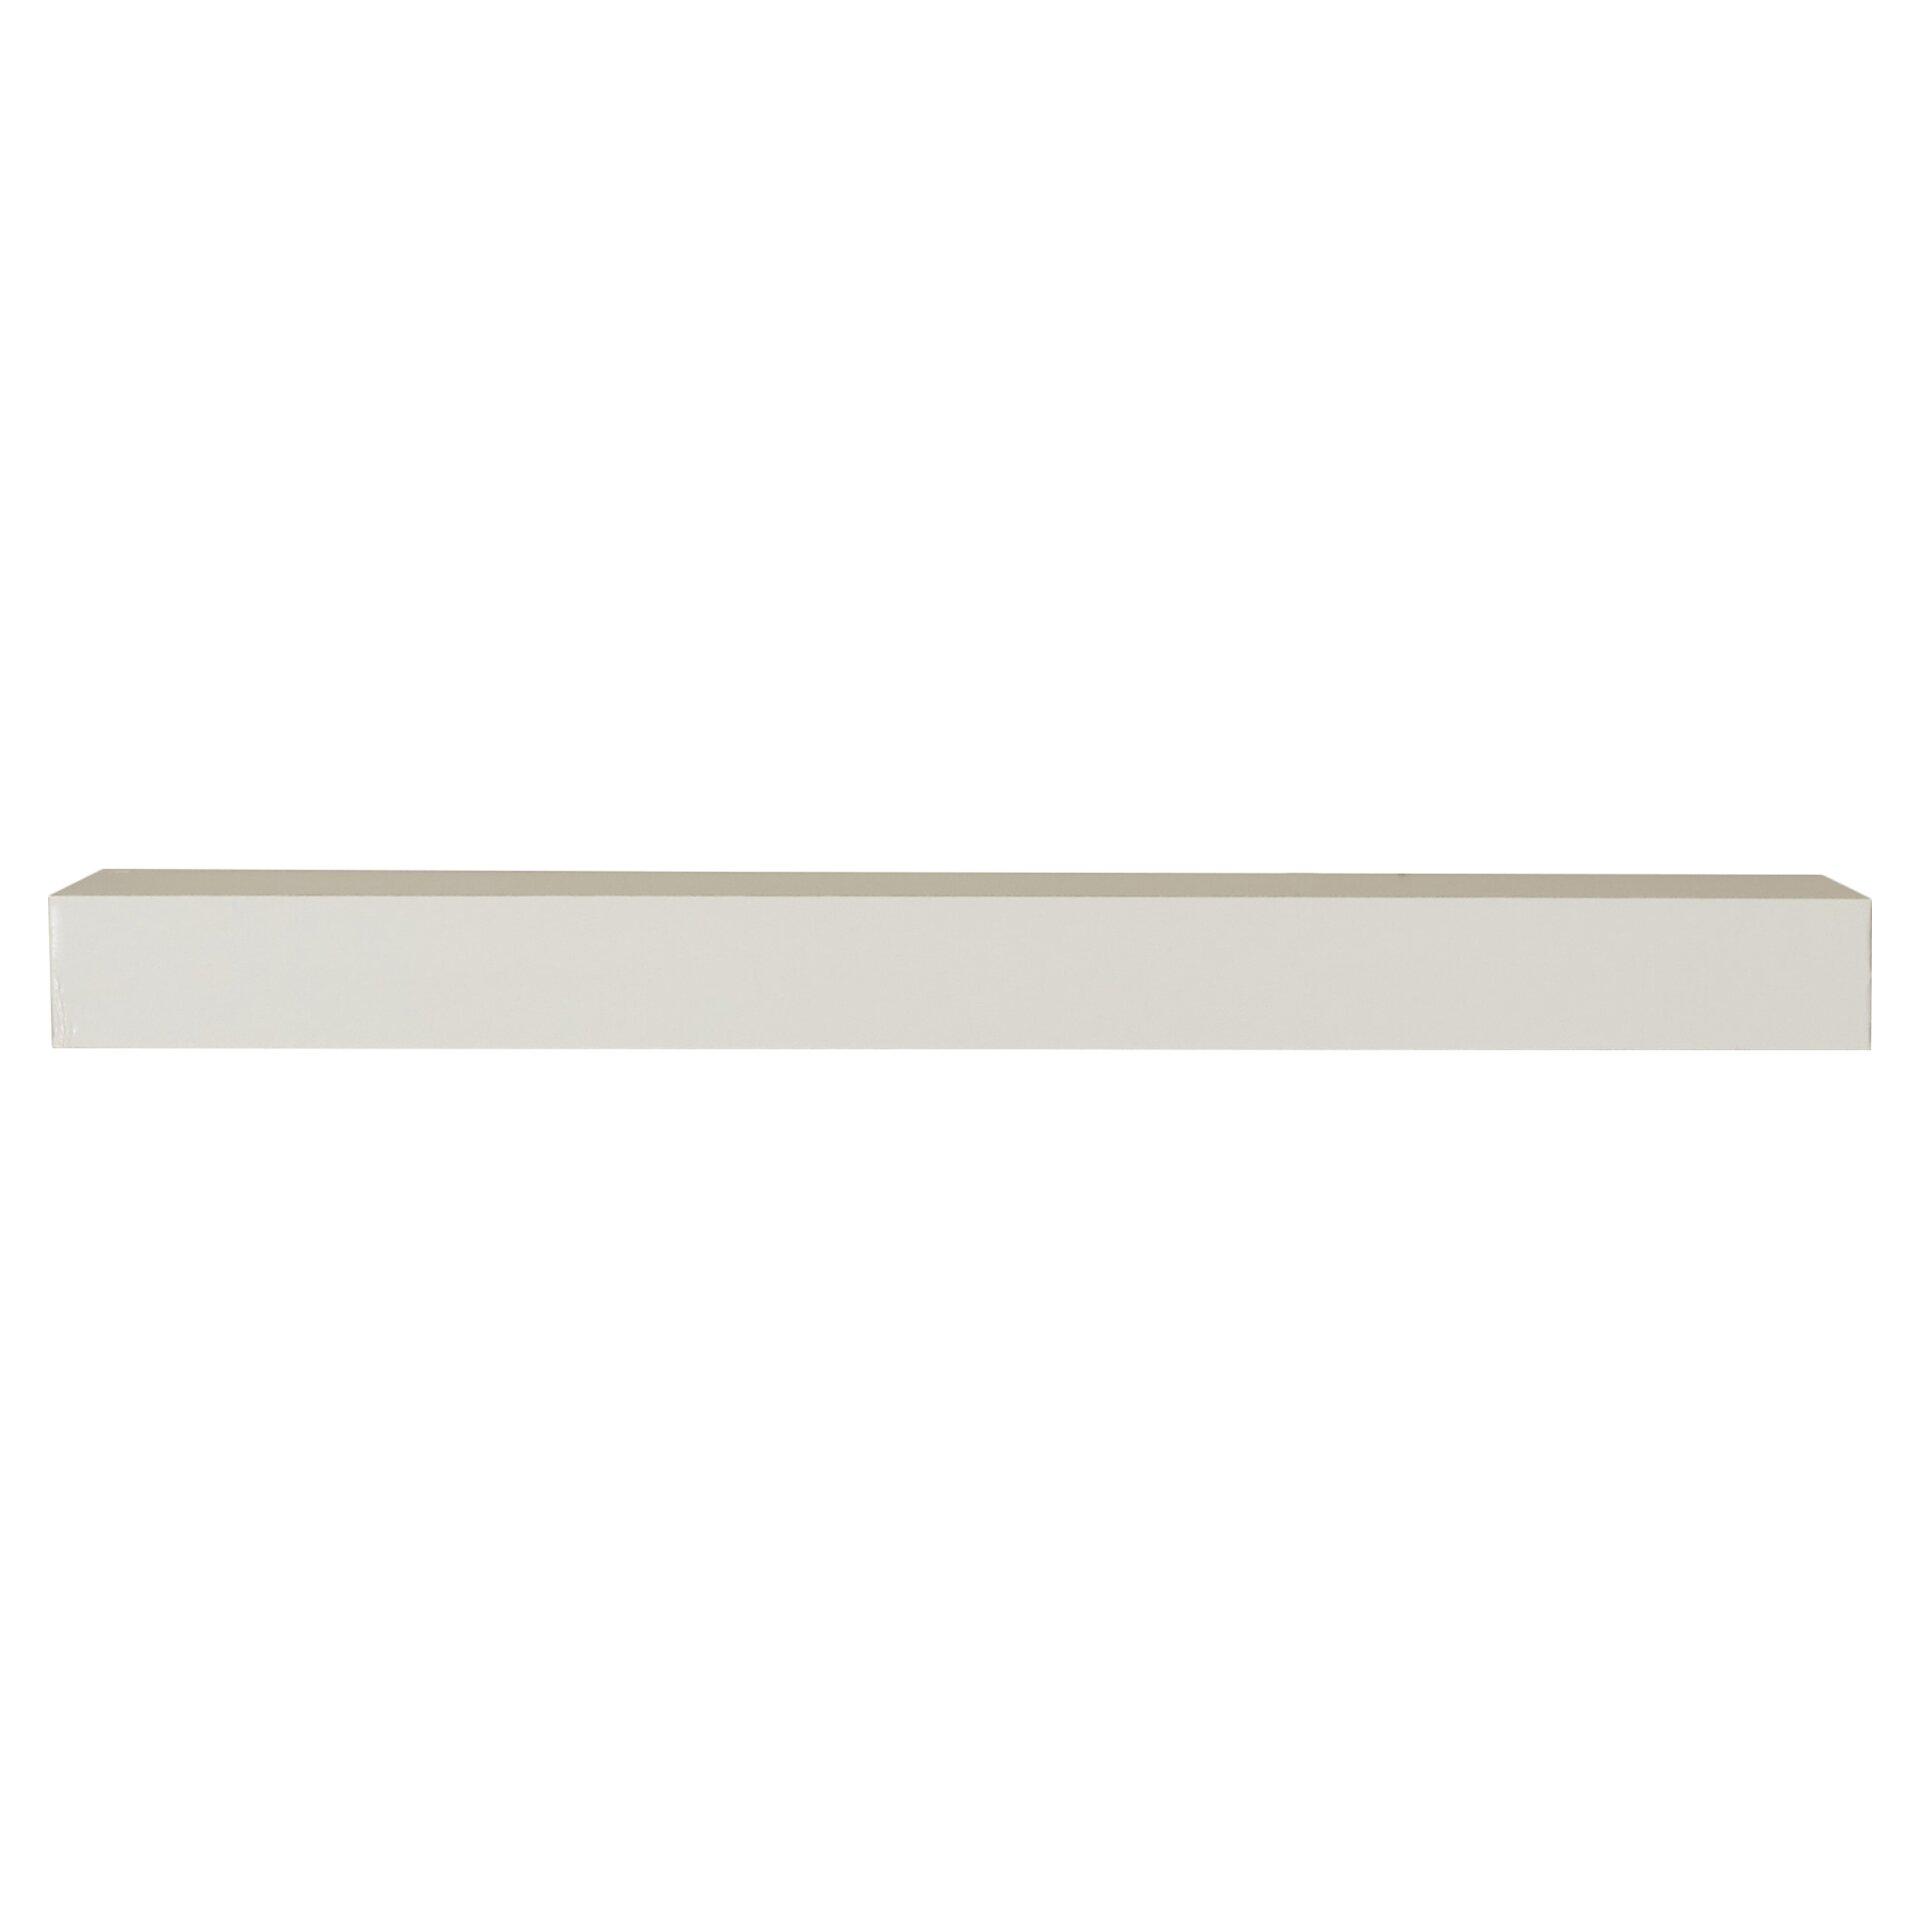 Way basics eco floating wall shelf reviews wayfair - Ikea etagere blanche ...